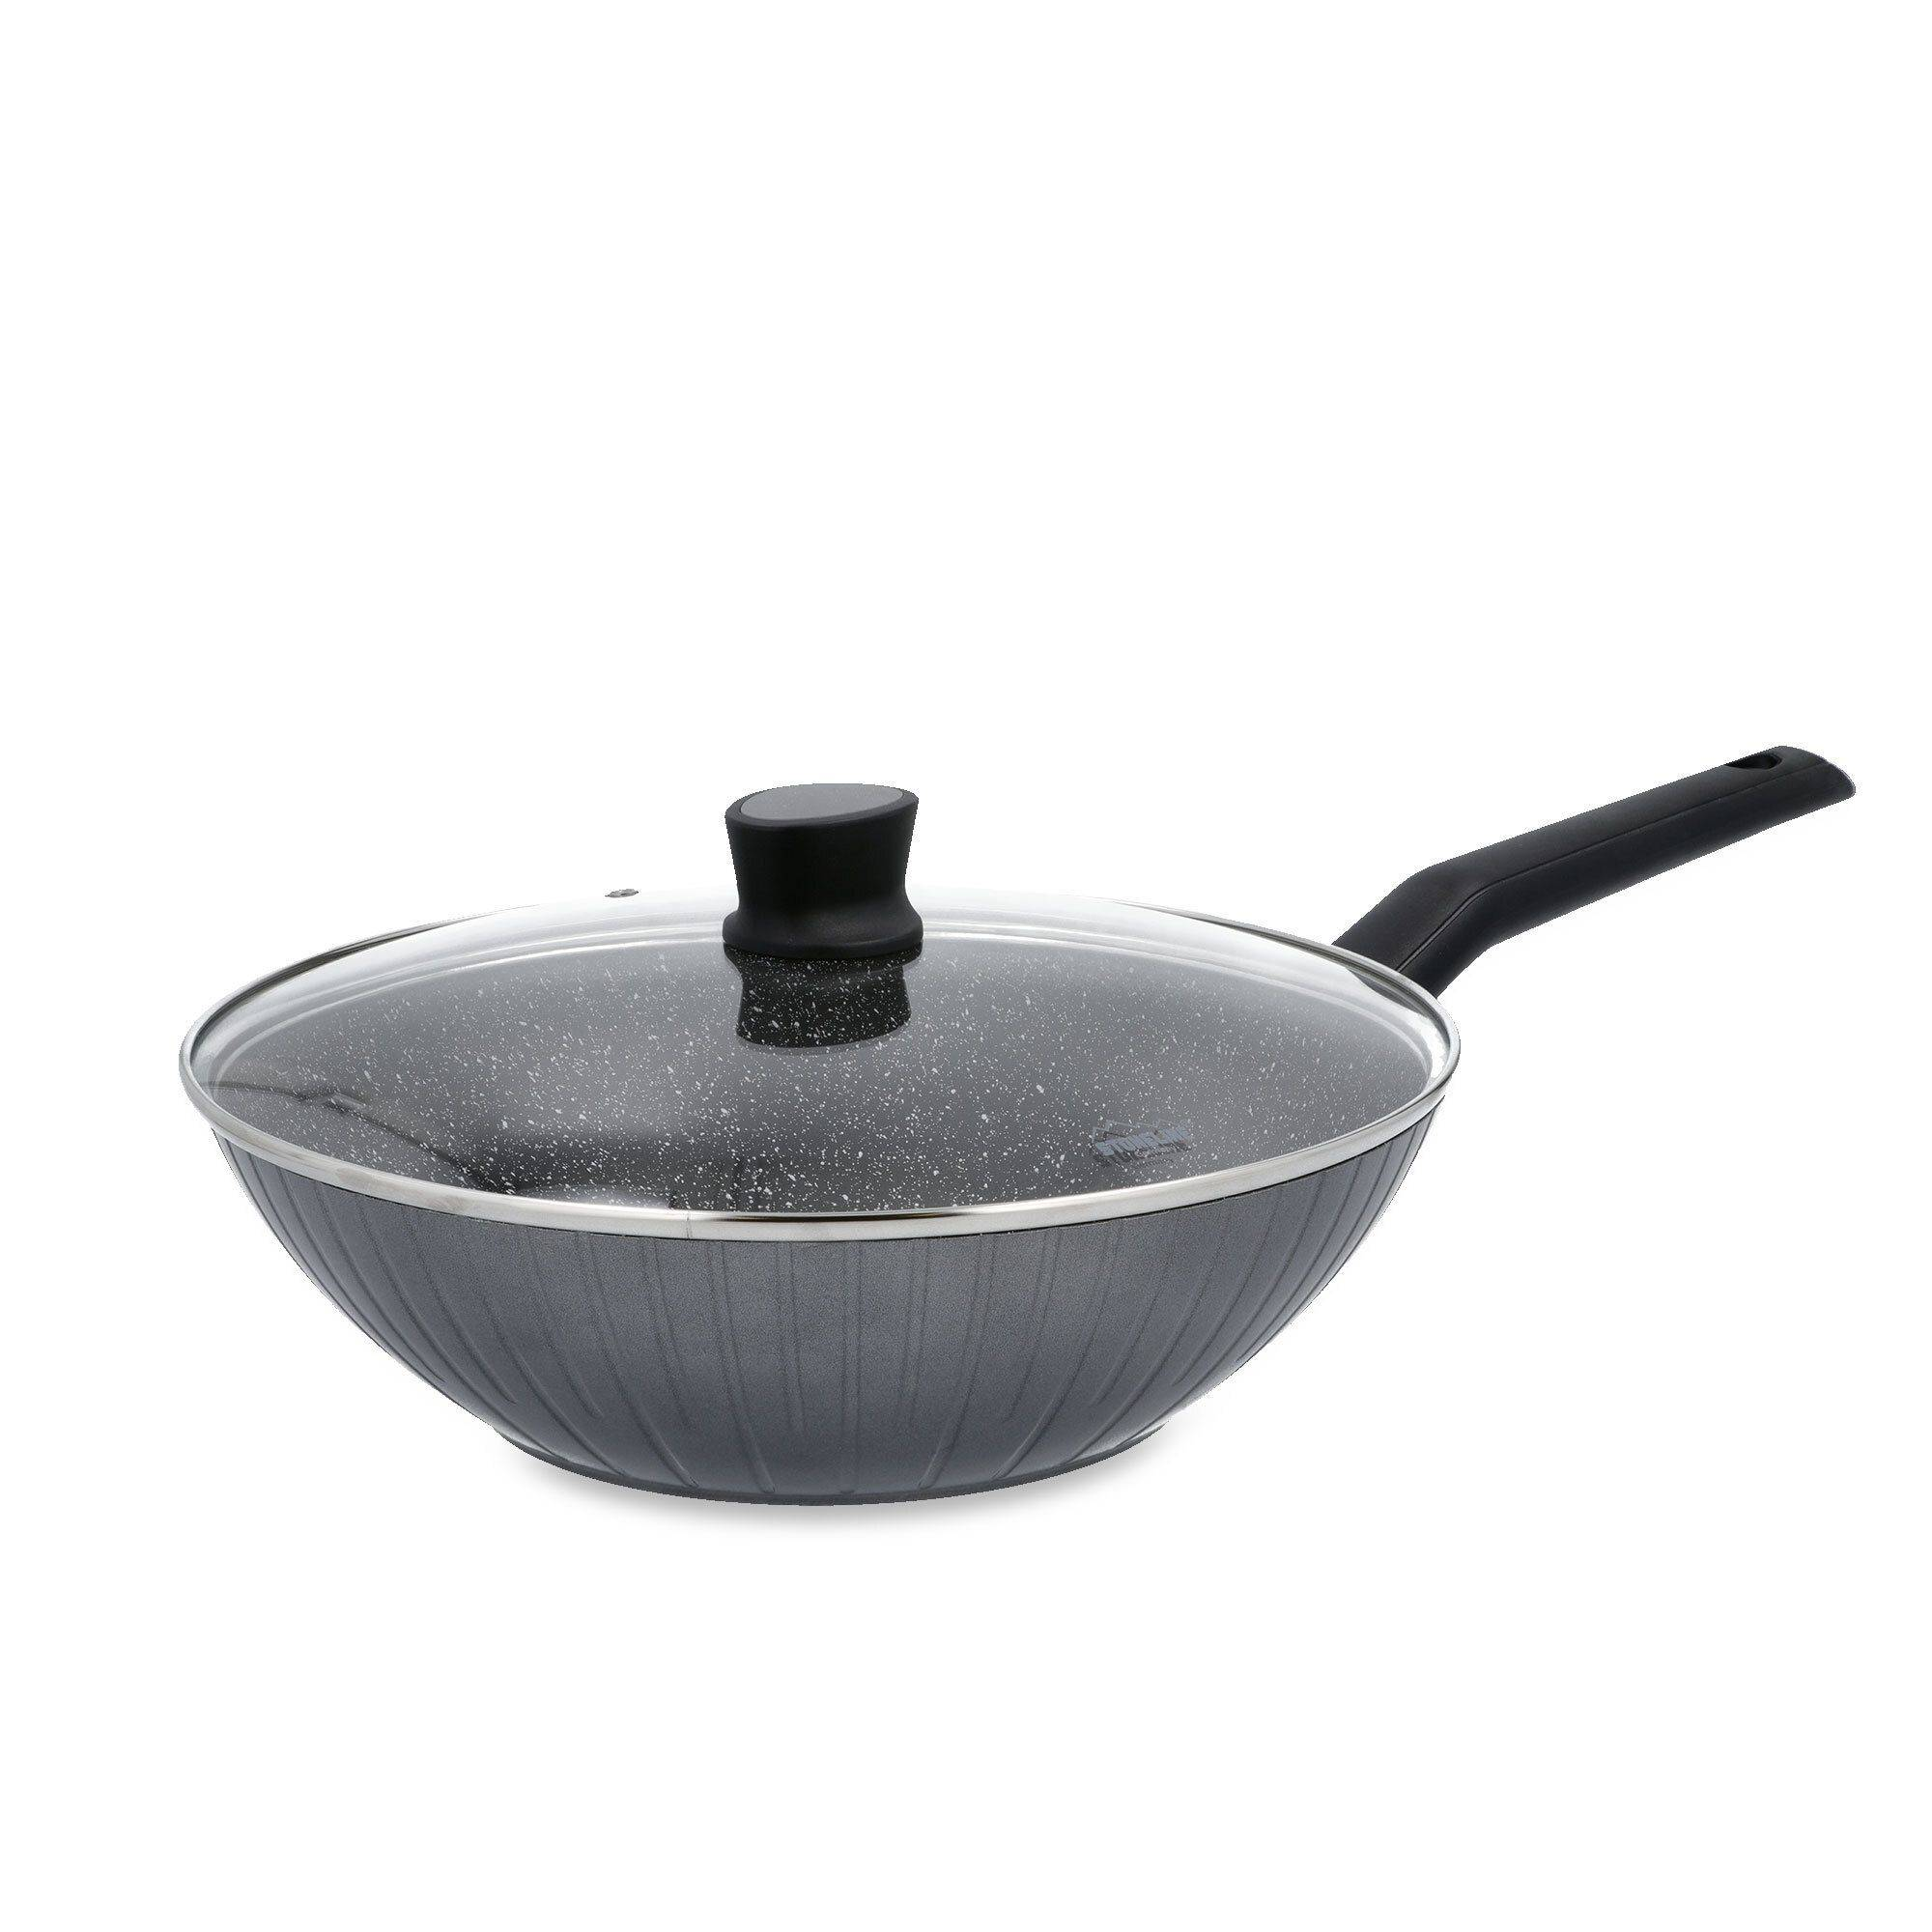 stoneline wok 30cm con coperchio in vetro